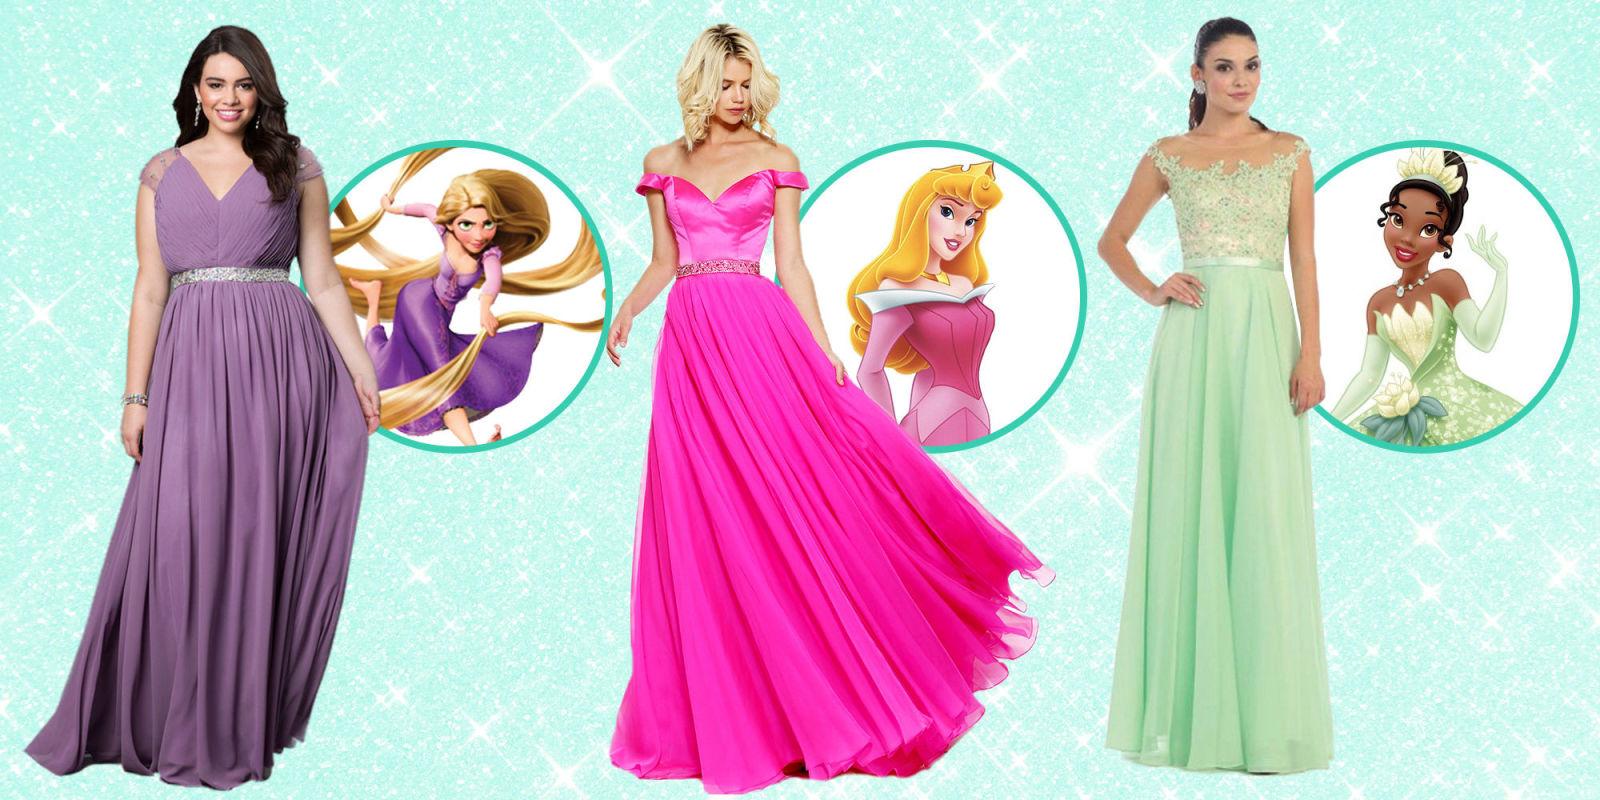 Pleasing Prom Dresses 2017 Best Formal Dresses For Prom Seventeen Short Hairstyles Gunalazisus